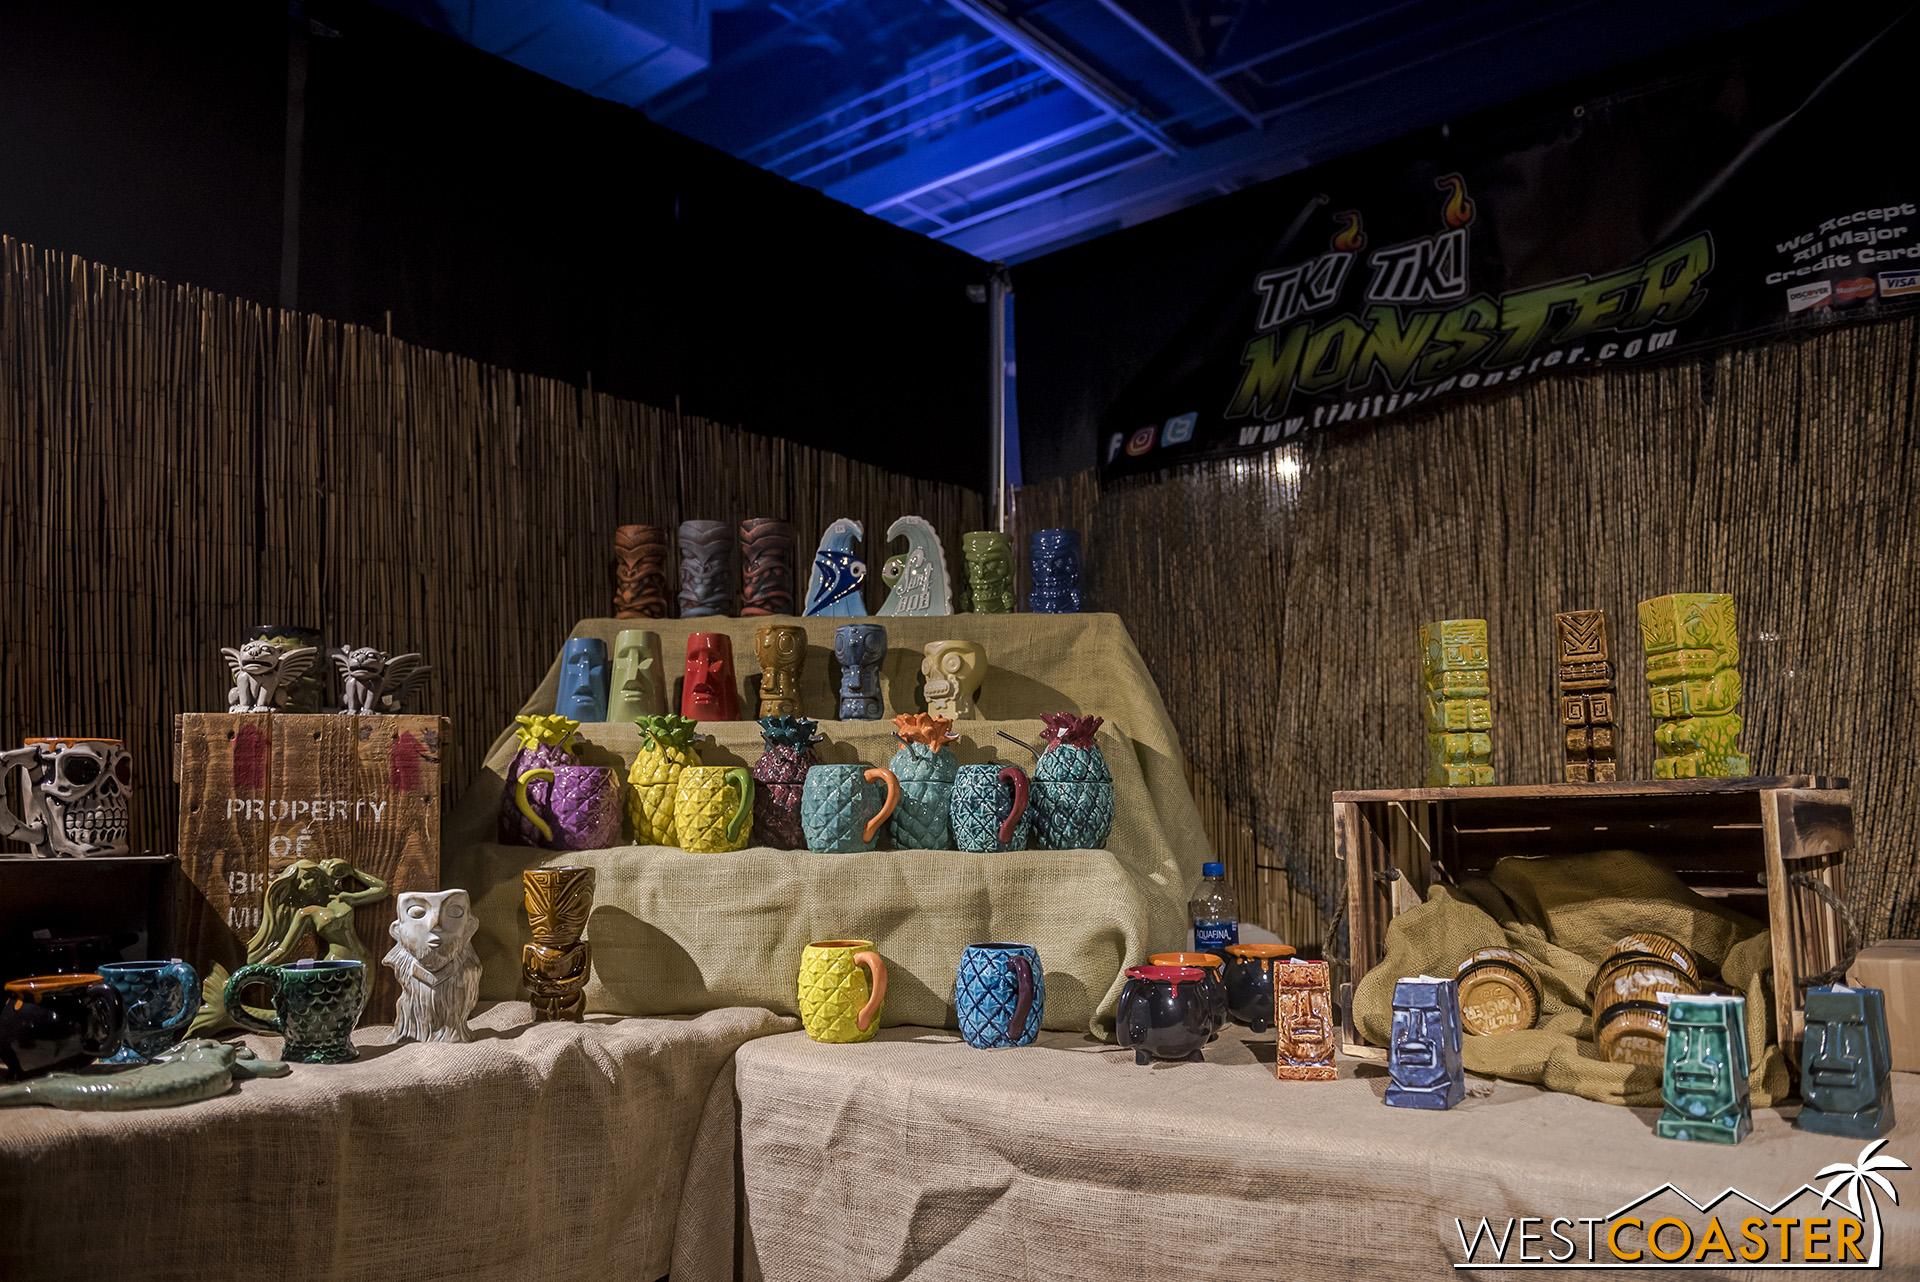 Tiki Tiki Monster  offered some great monster tiki mugs for sale.